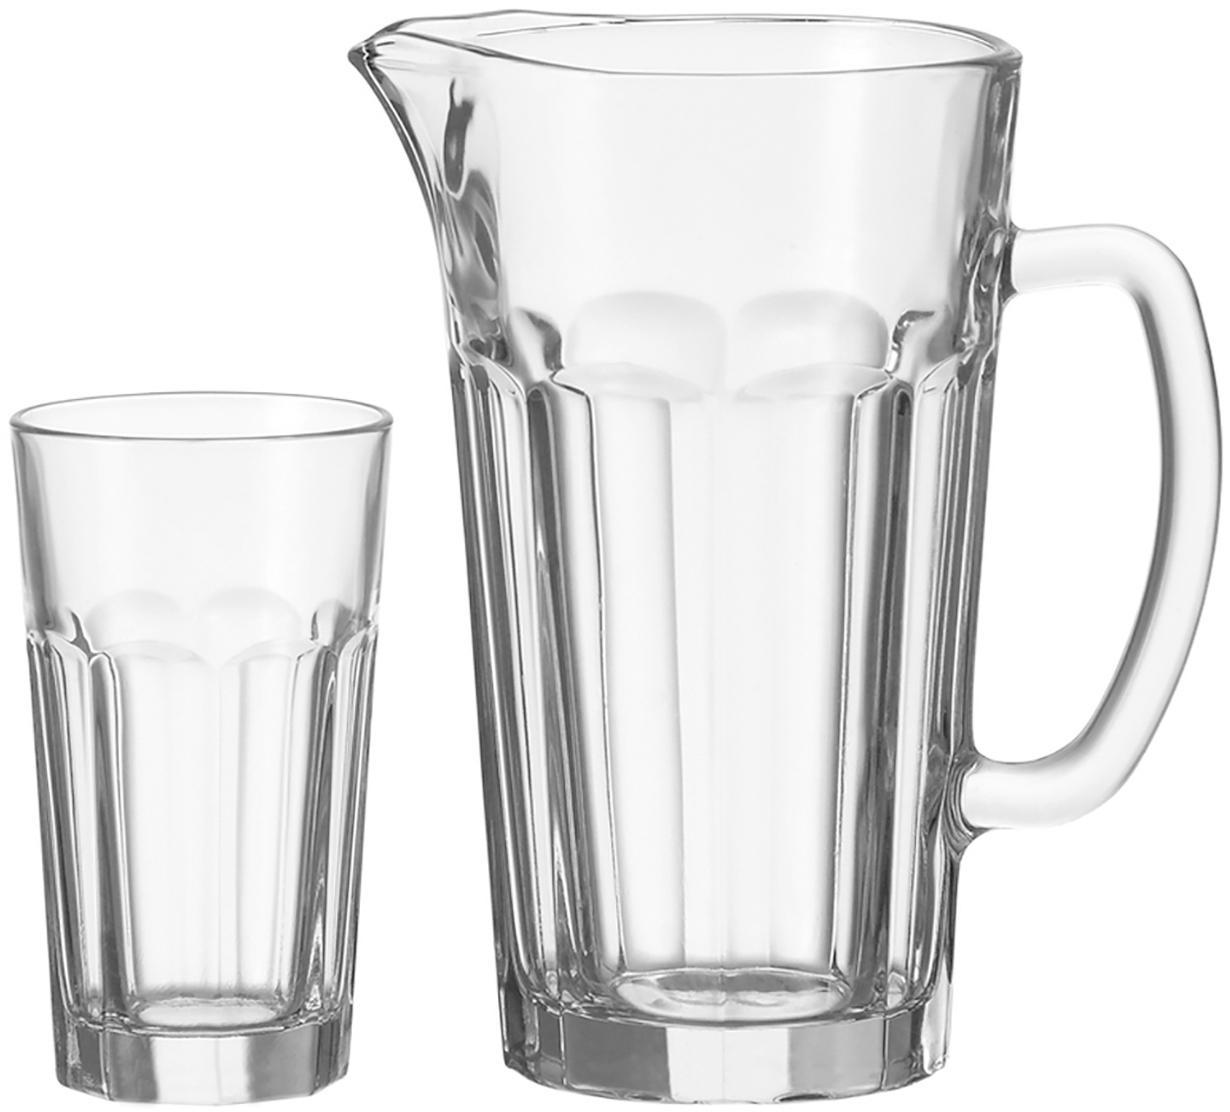 Dzbanek ze szklankami, 7 szt., Szkło, Transparentny, Komplet z różnymi rozmiarami